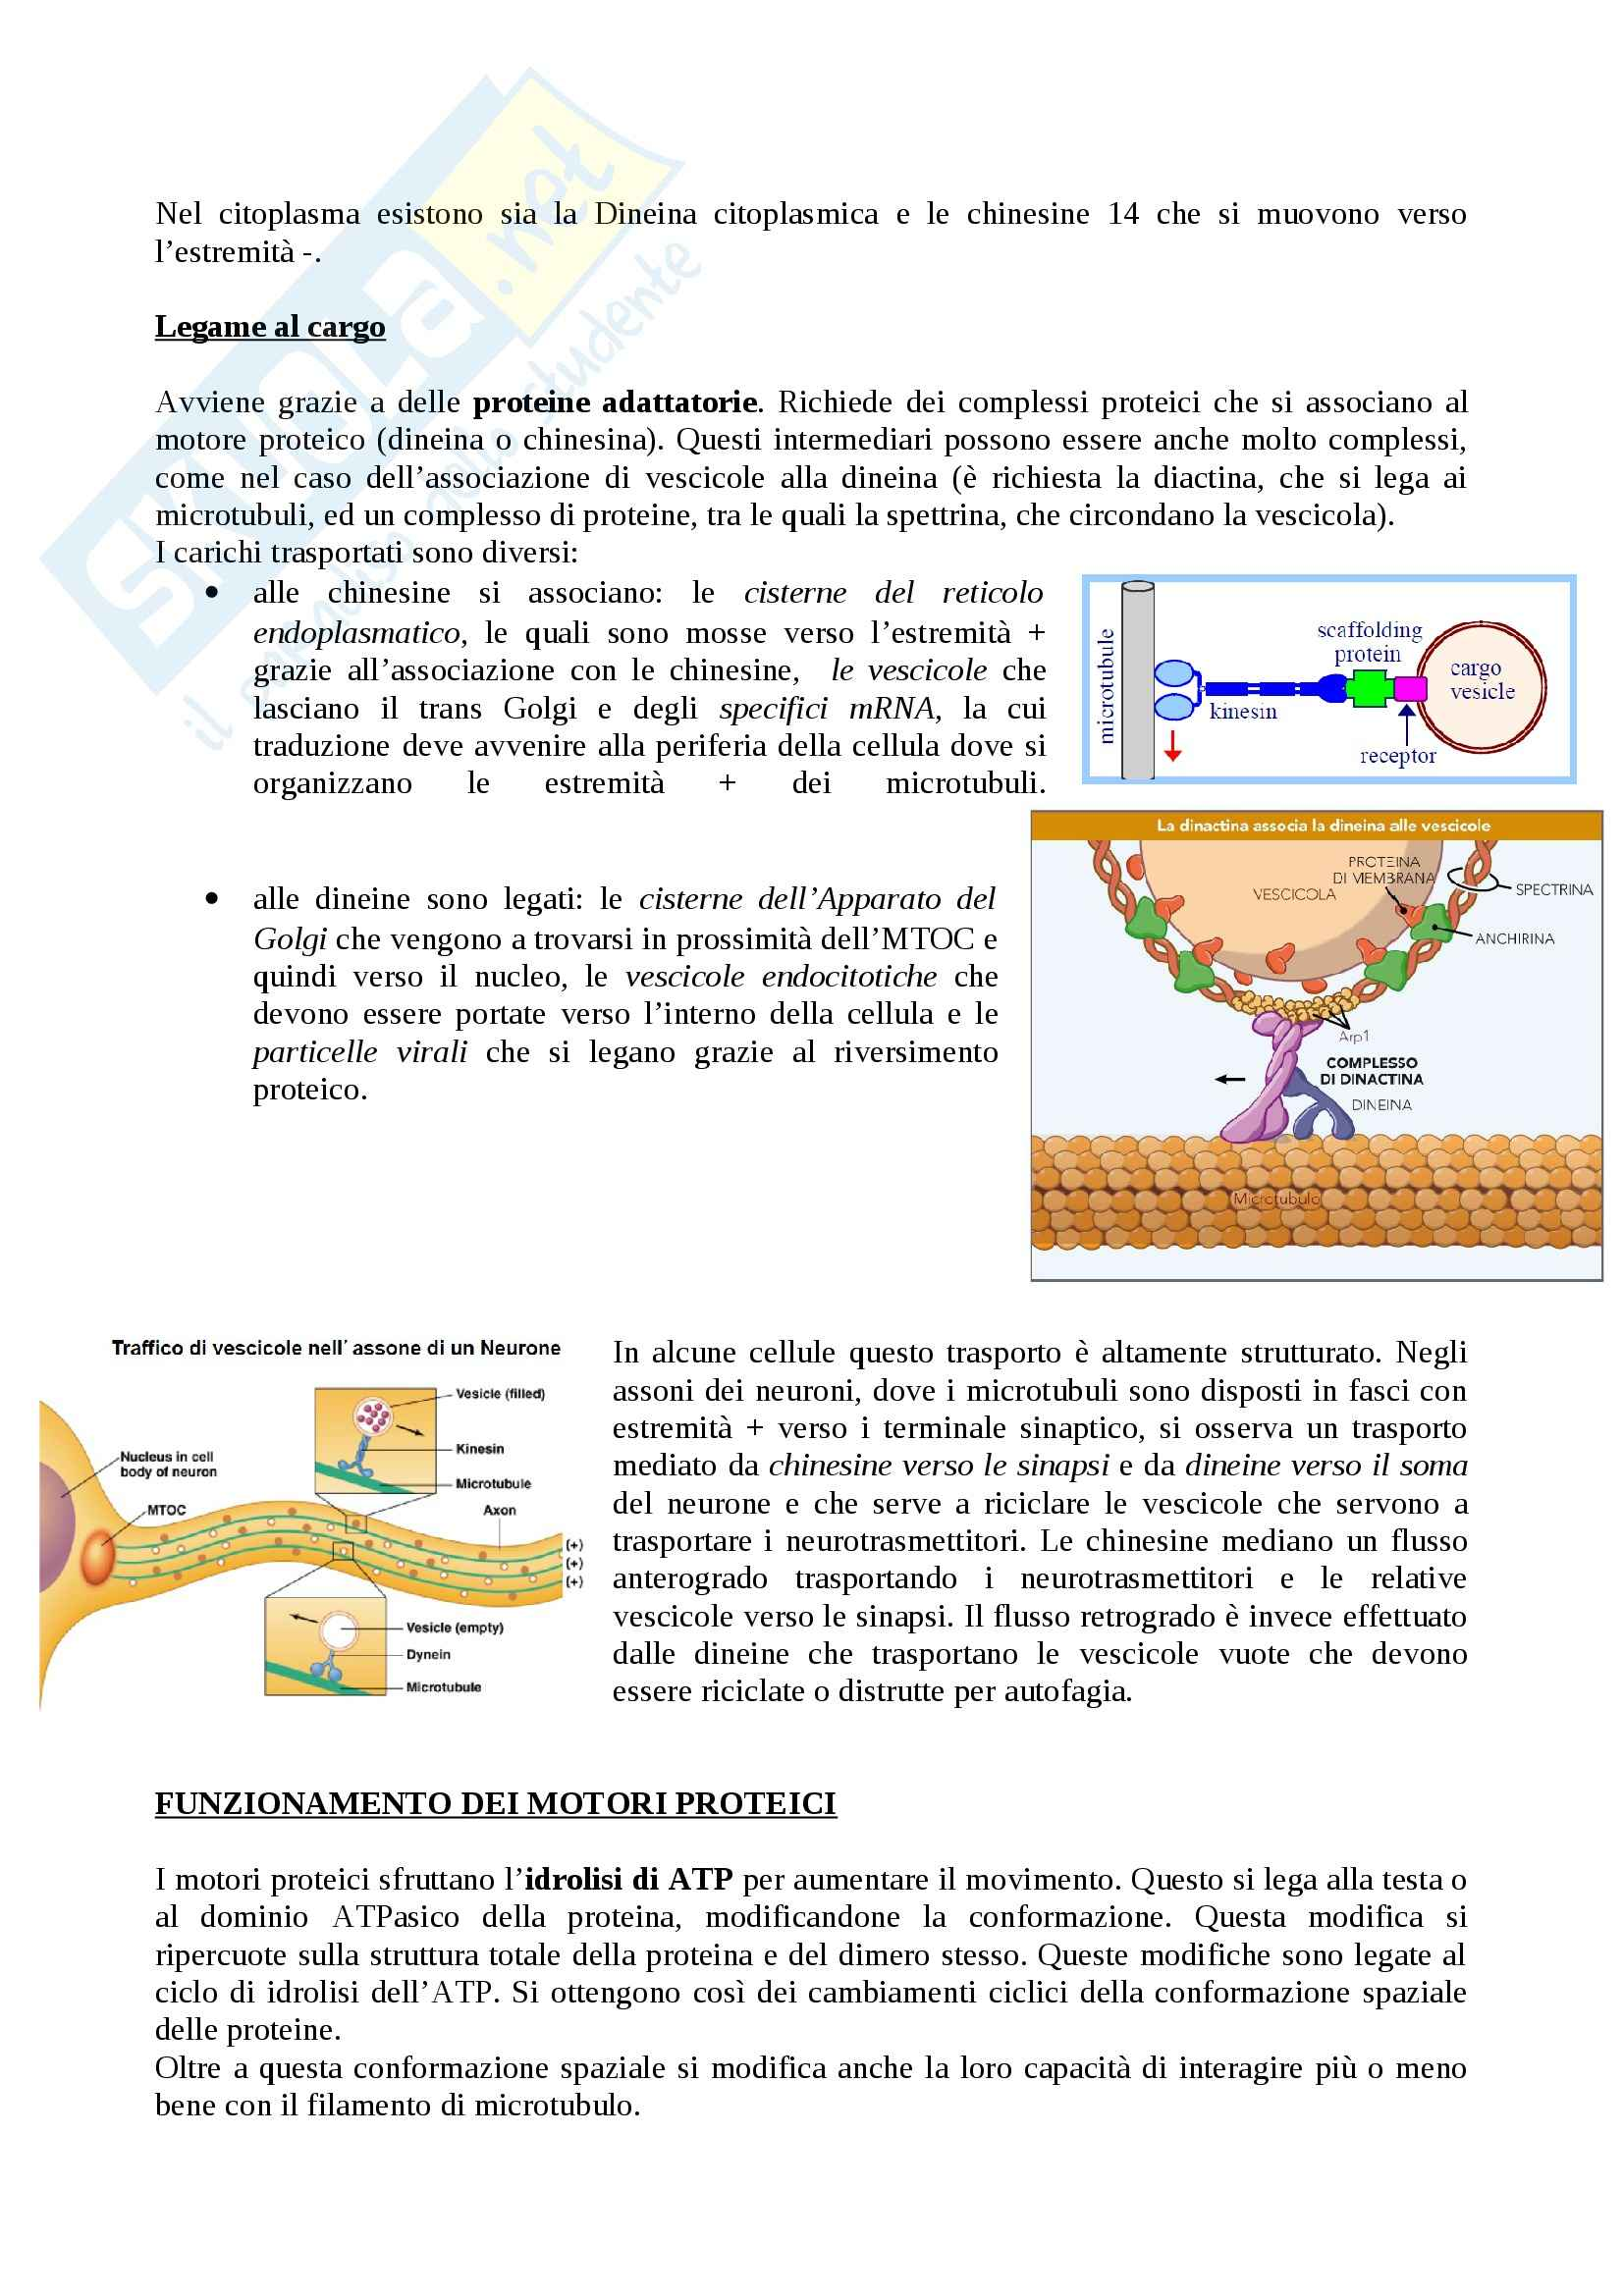 Citologia - motori proteici dei microtubuli Pag. 2